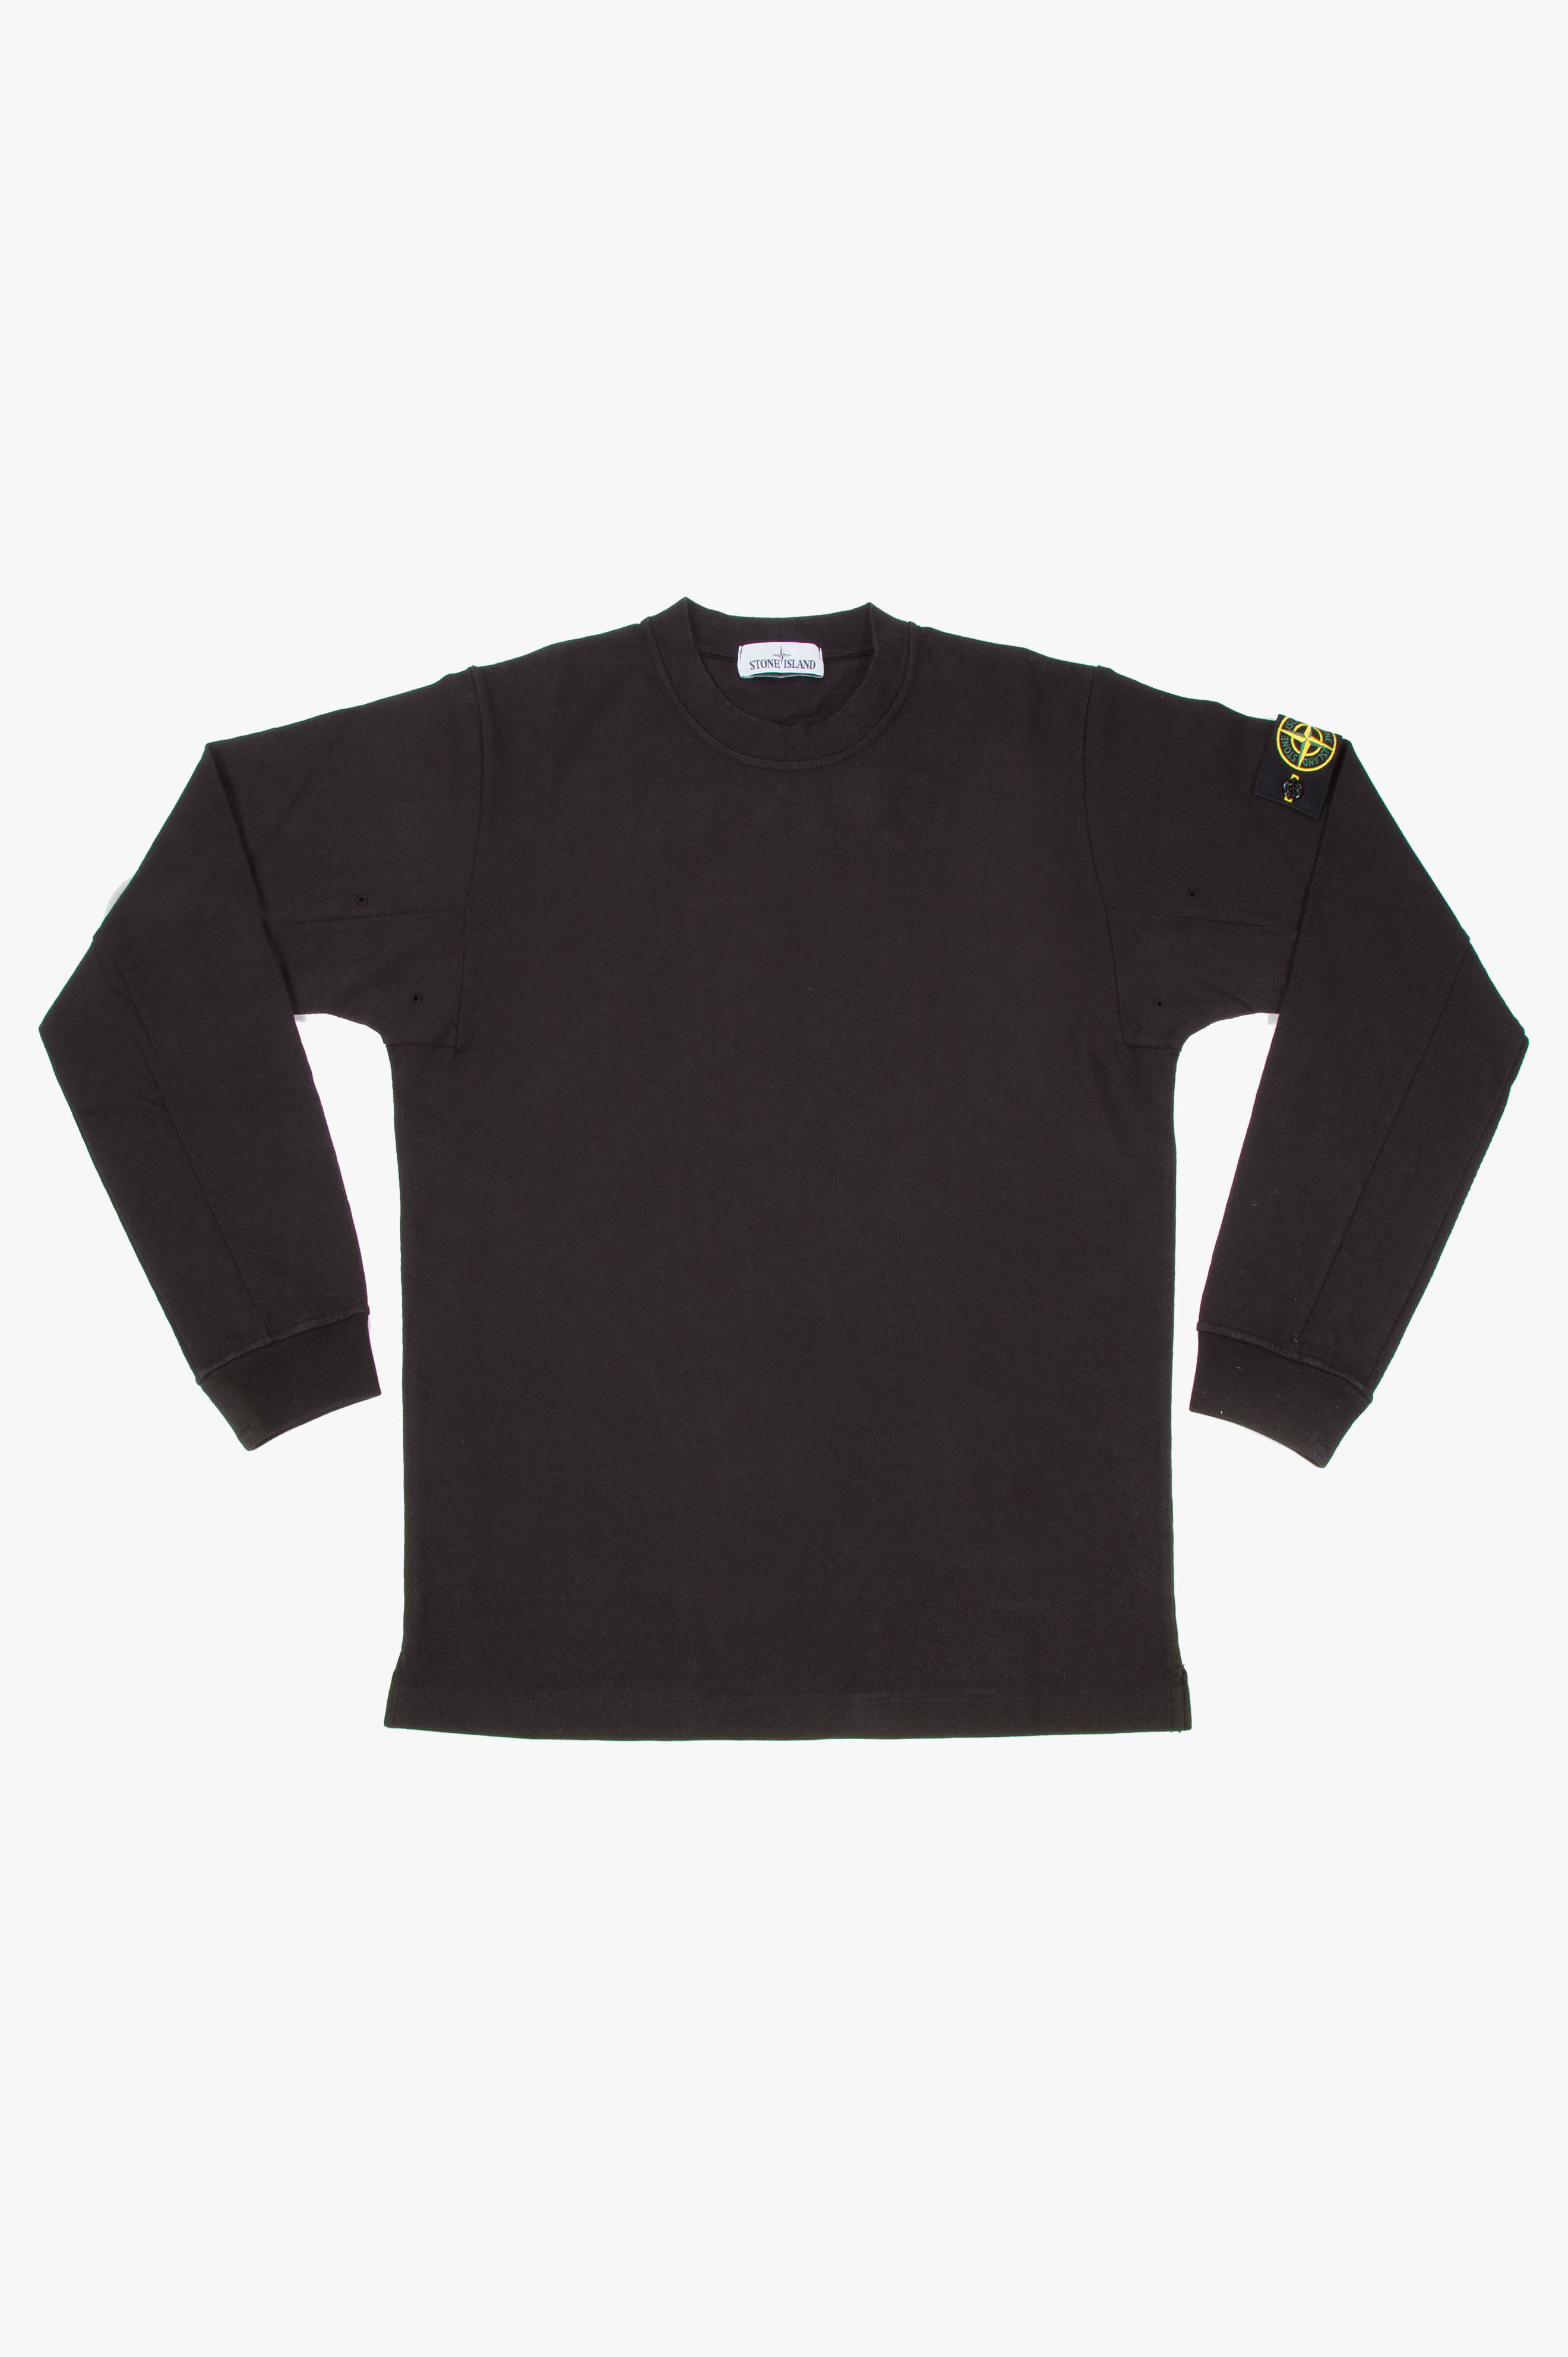 Crew Neck Long Sleeve T-Shirt Black